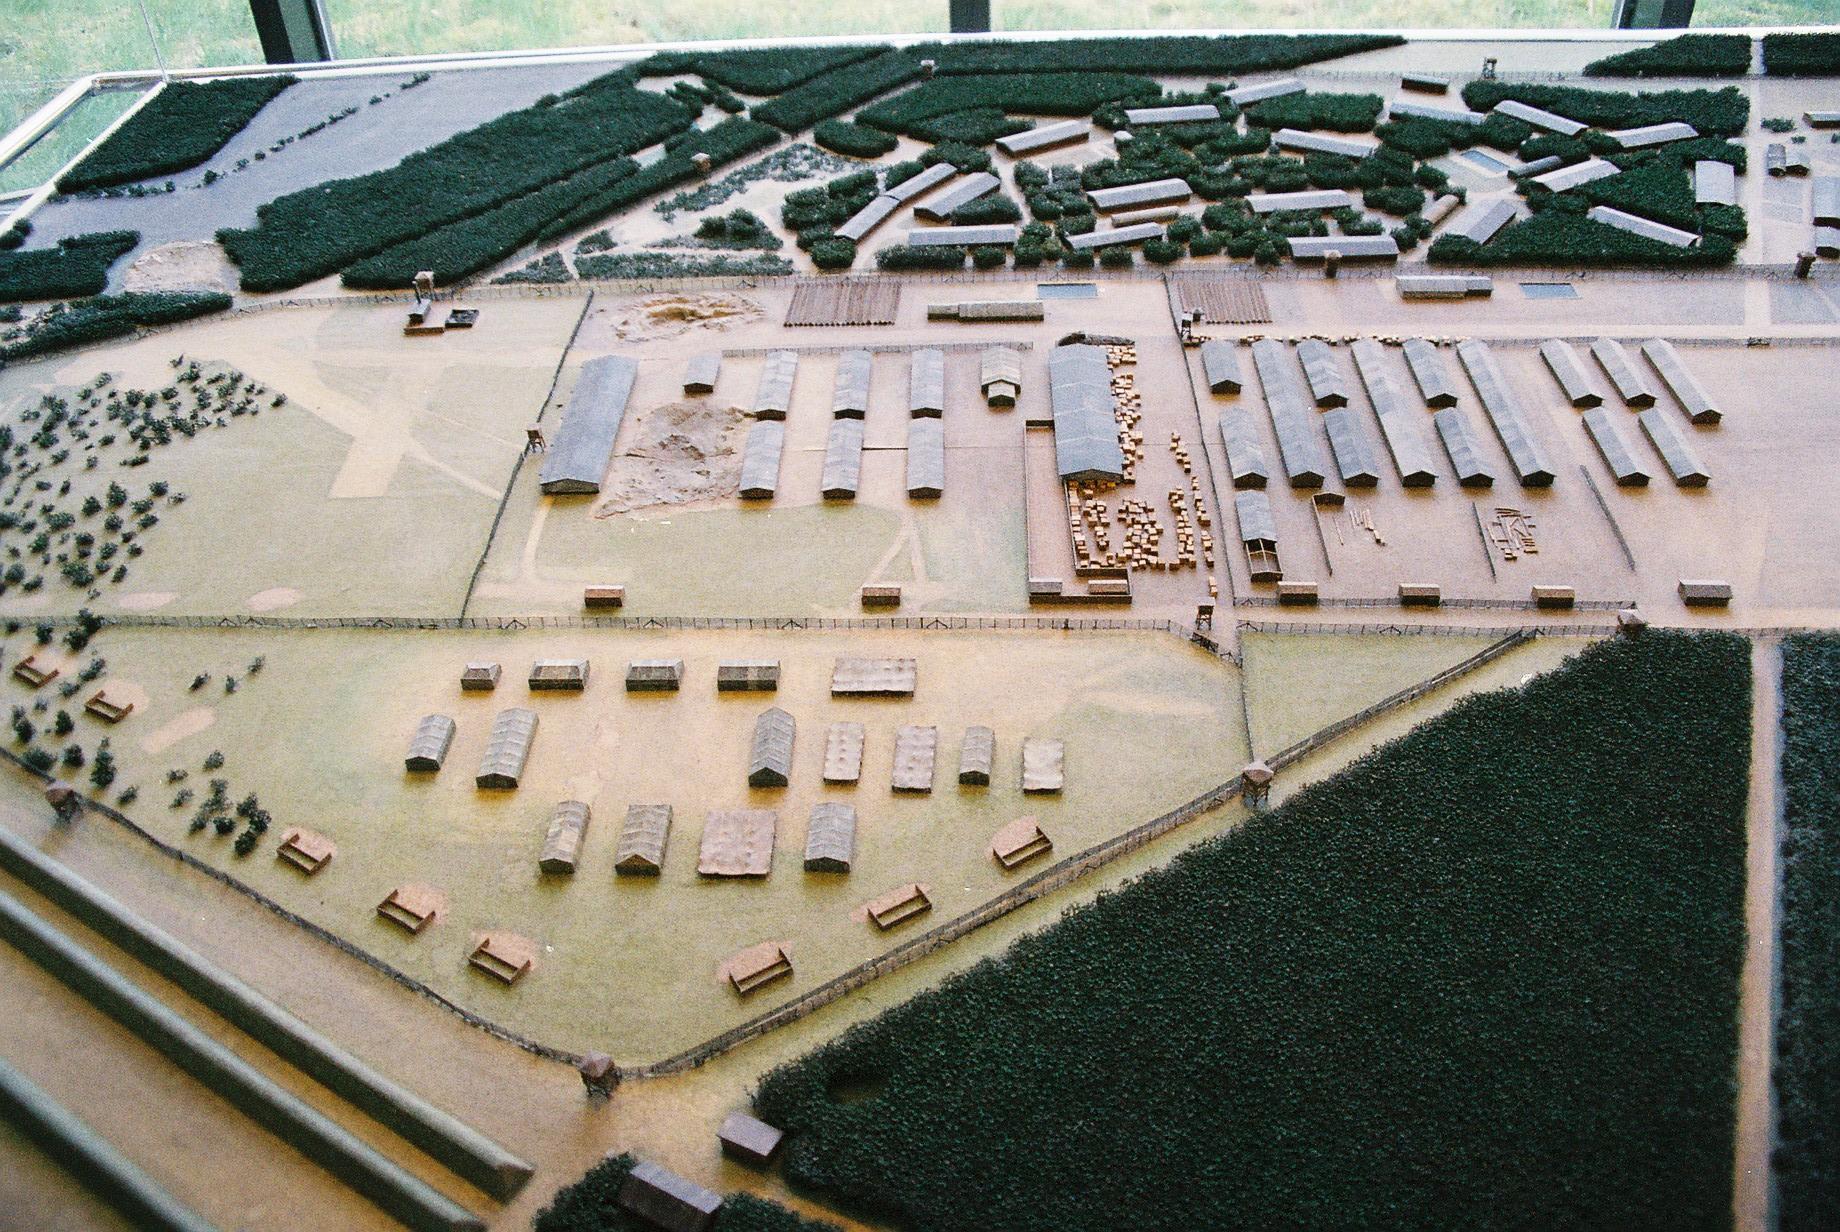 Maquette du camp de Bergen-Belsen